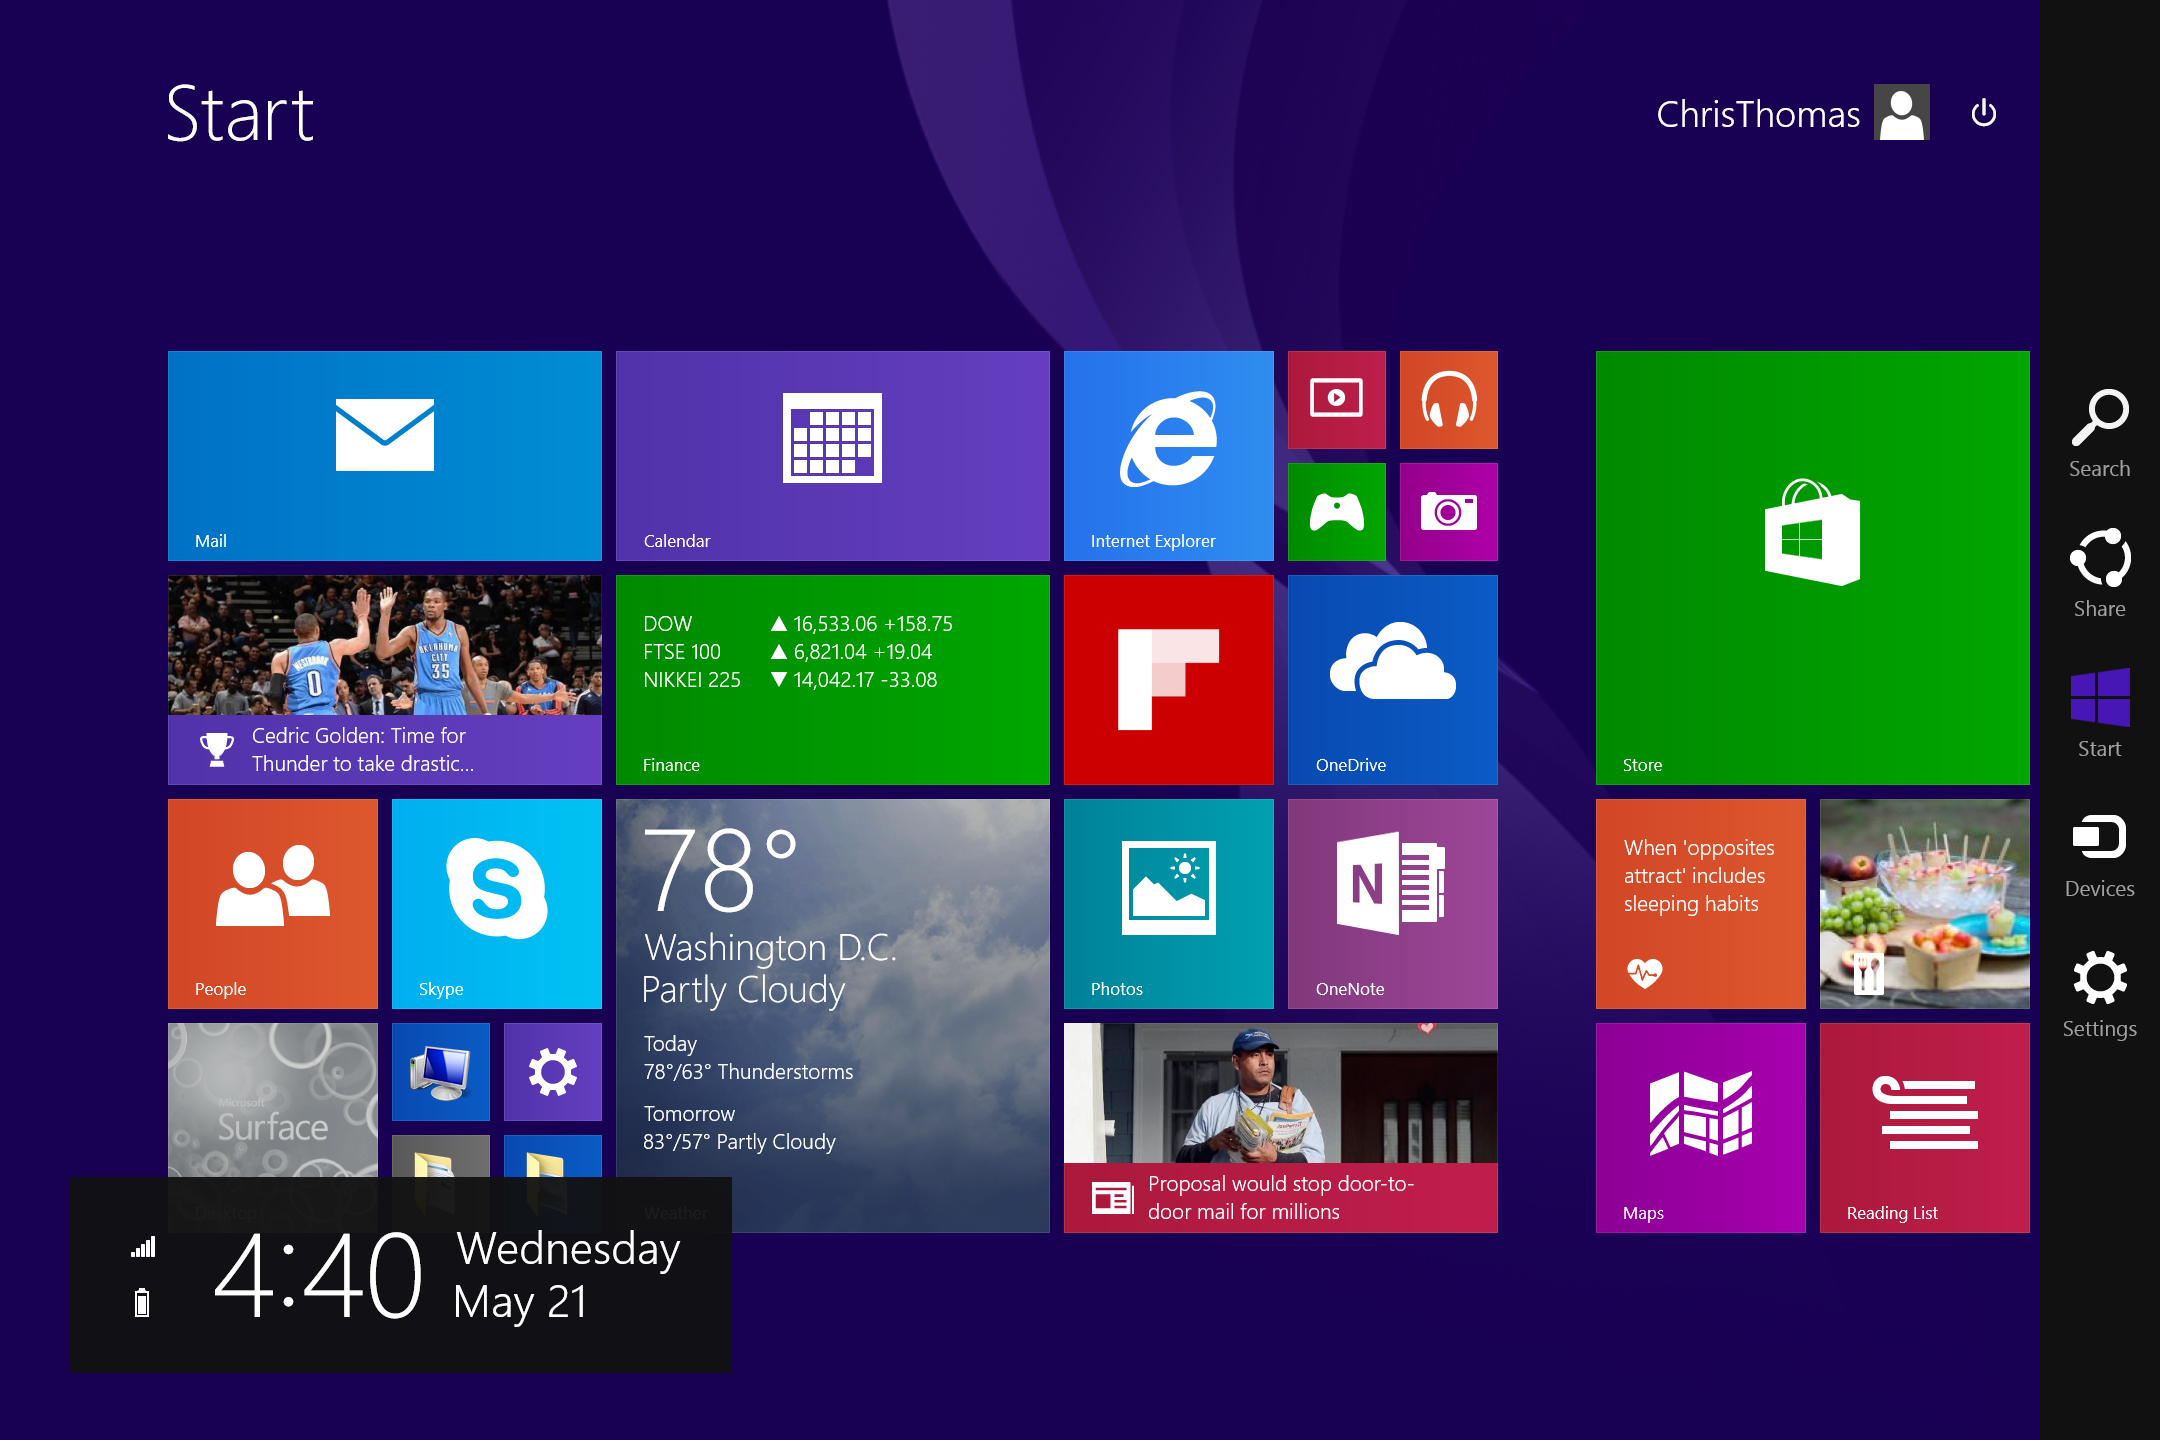 A screenshot of the Microsoft Surface 3's start screen.